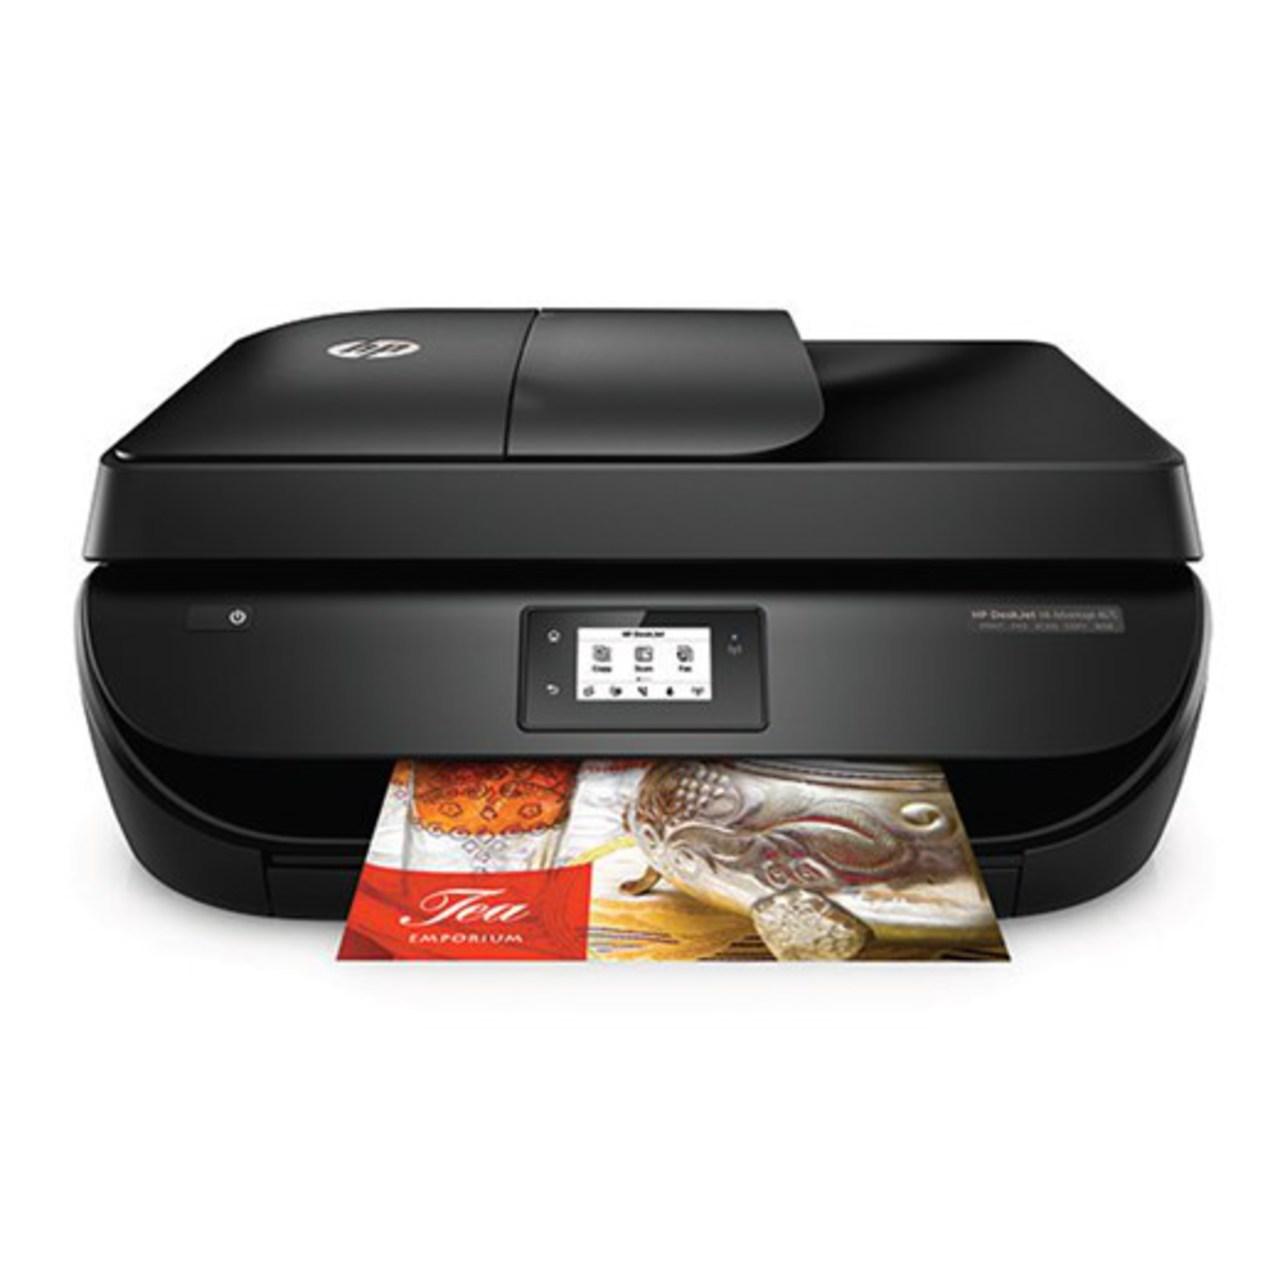 МФУ HP Deskjet Ink Advantage 4675 F1H97C цветное струйное с Wi-Fi